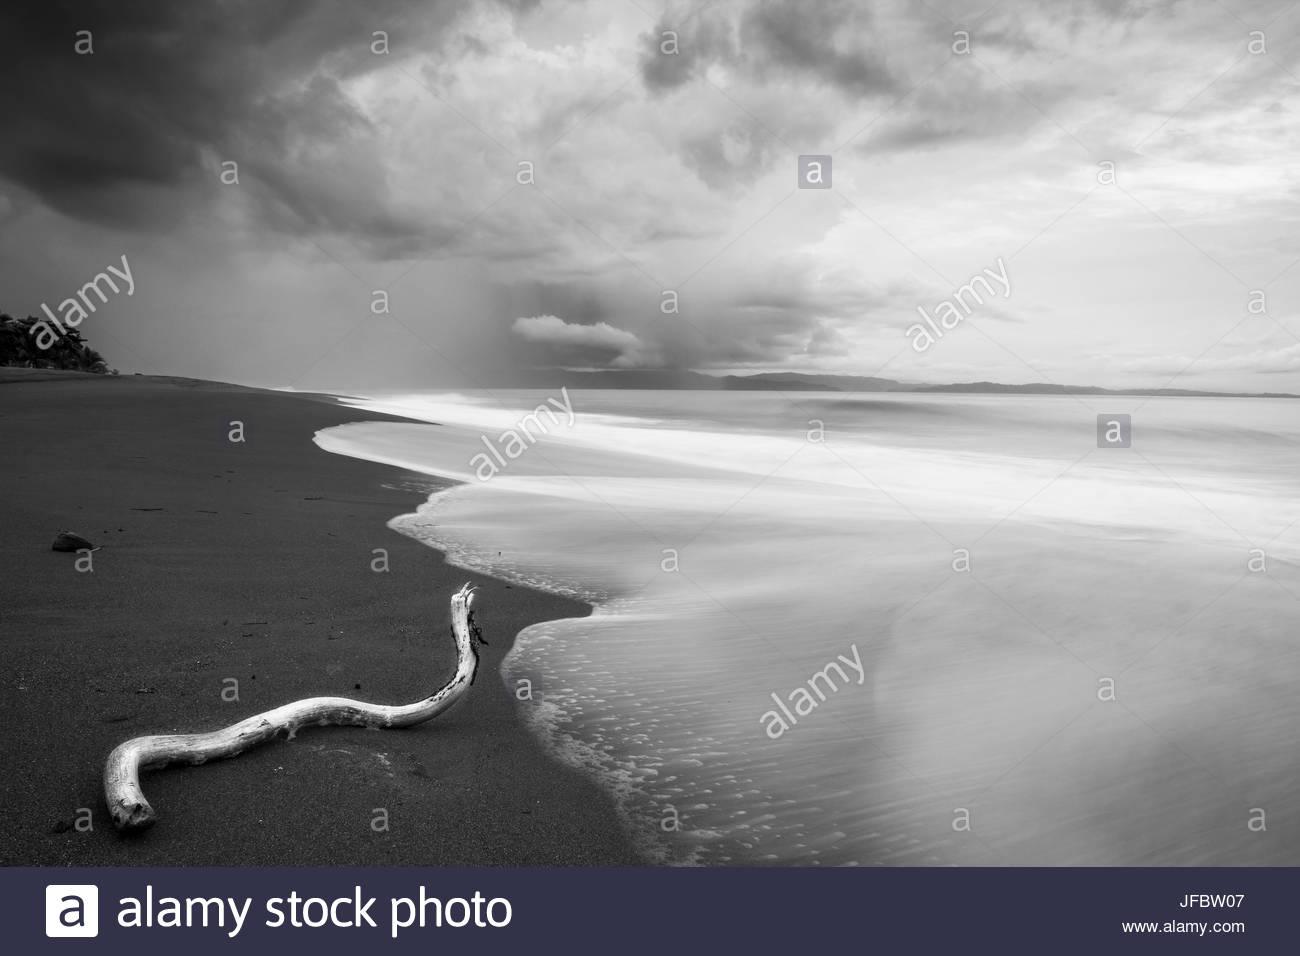 Stormy beach on the Osa Peninsula of Costa Rica. - Stock Image